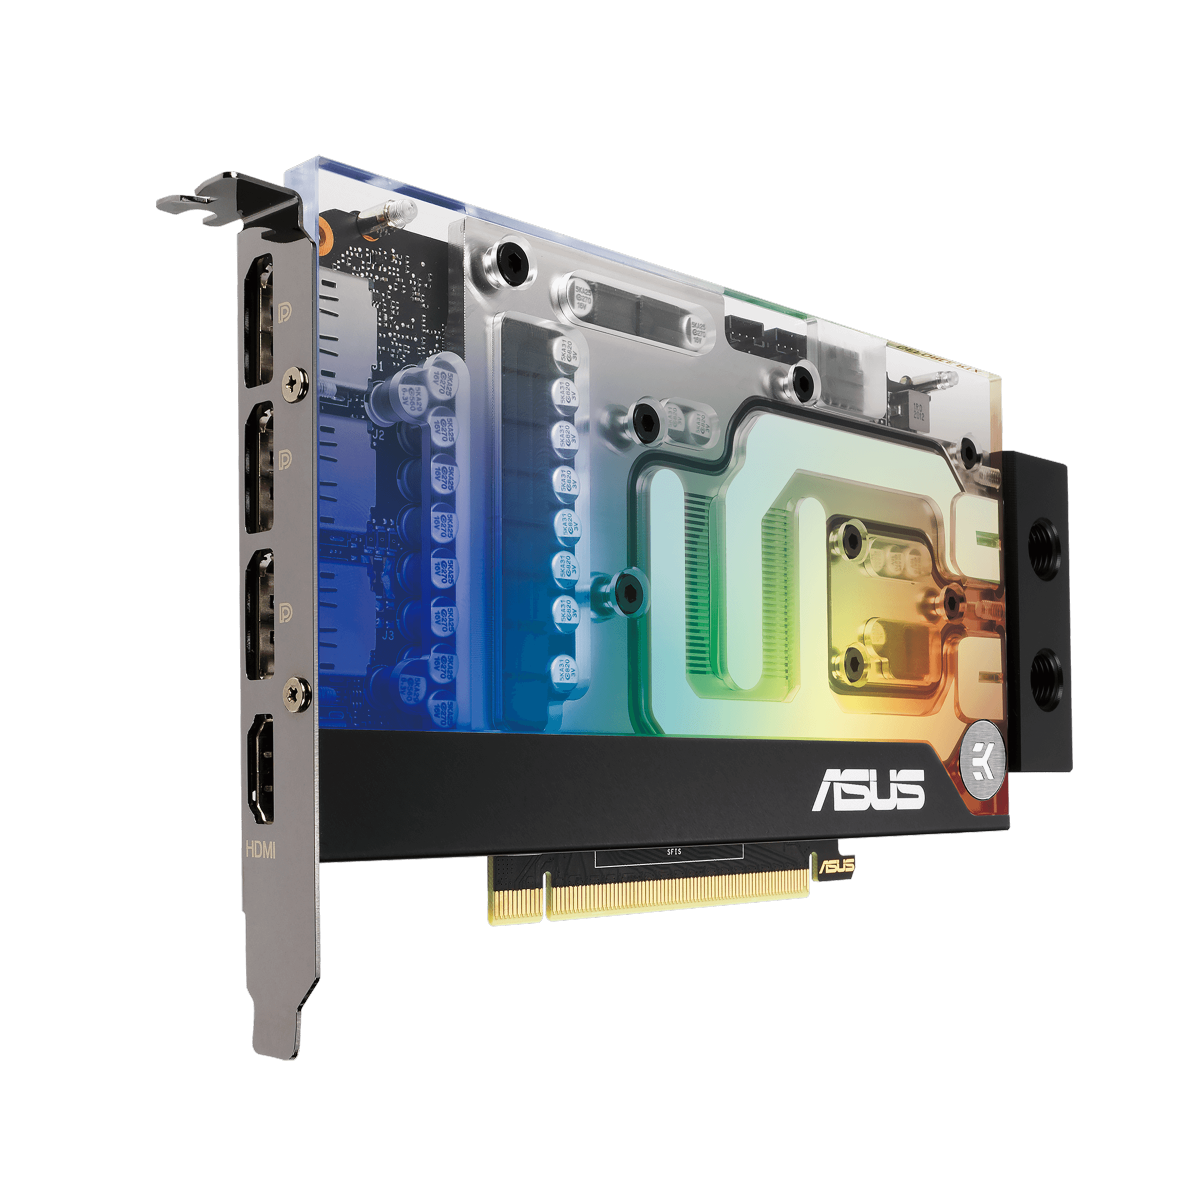 Placa de Vídeo ASUS GeForce RTX 3070 EKWB, 8GB, GDDR6, 256bit, RTX3070-8G-EK - Open Box